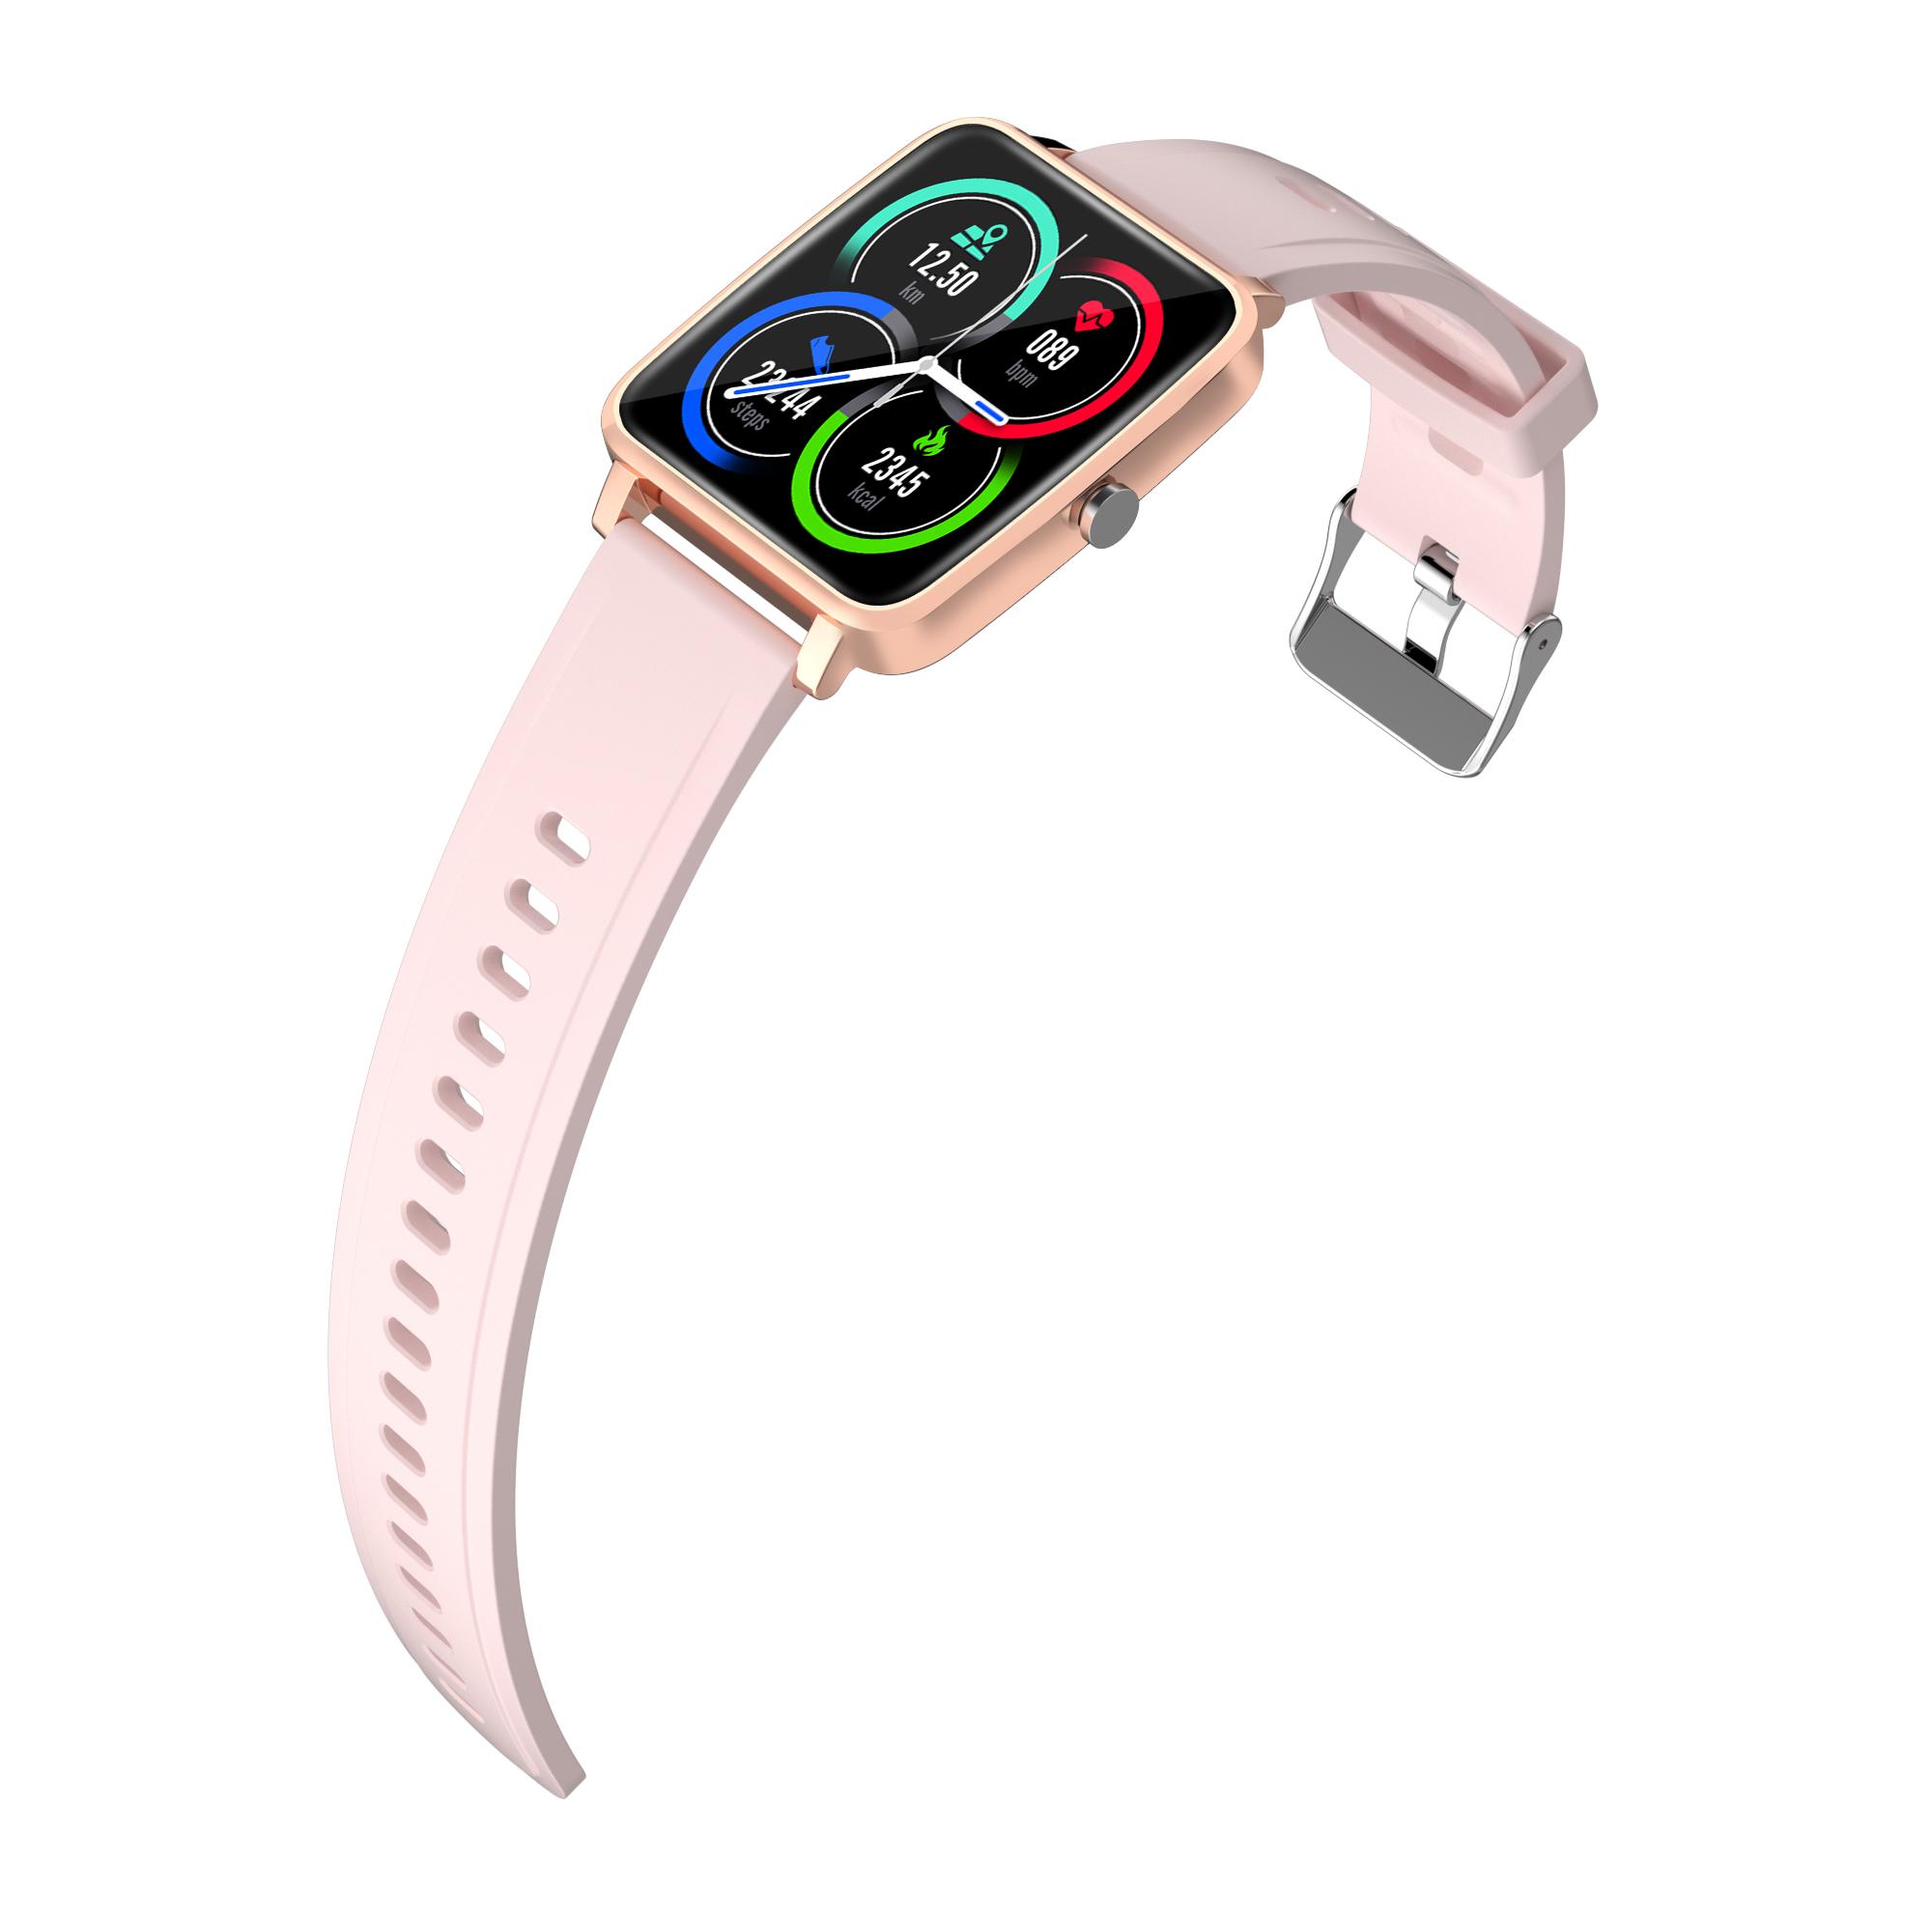 V10 Smart Watch Bluetooth Sports Health Wristband Heart Rate Fitness Pedometer Smartwatch Pink